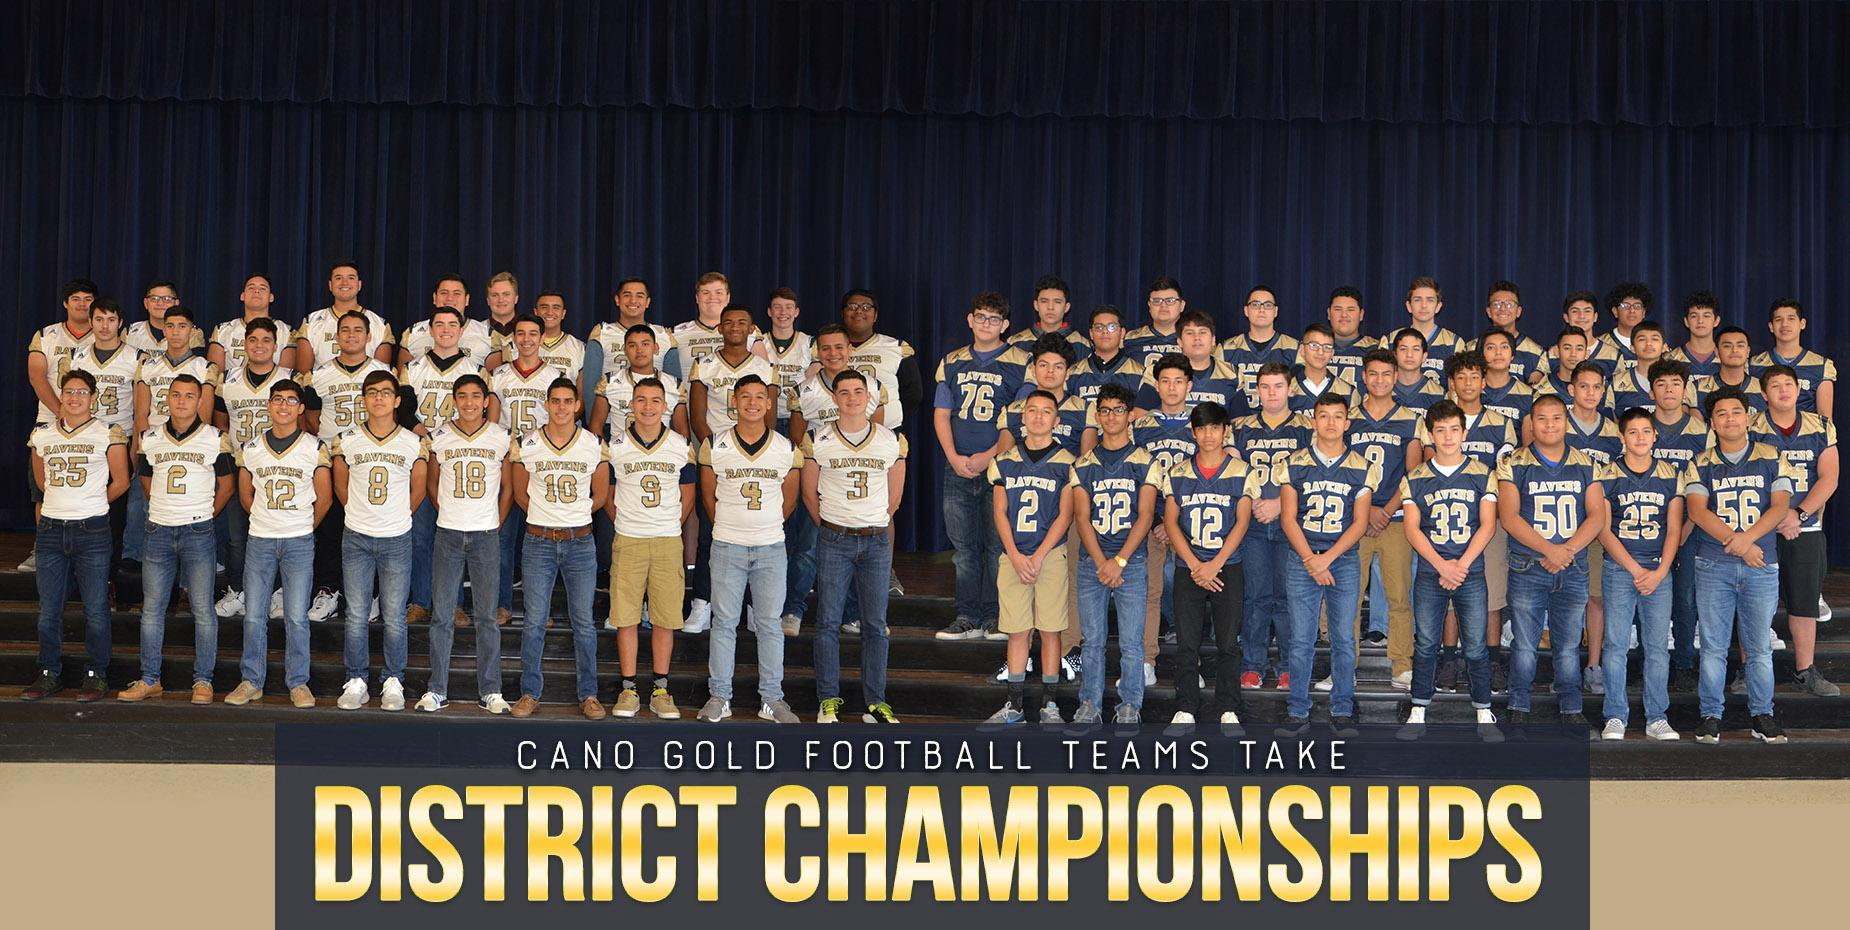 Cano Gold Football Teams take District Championships